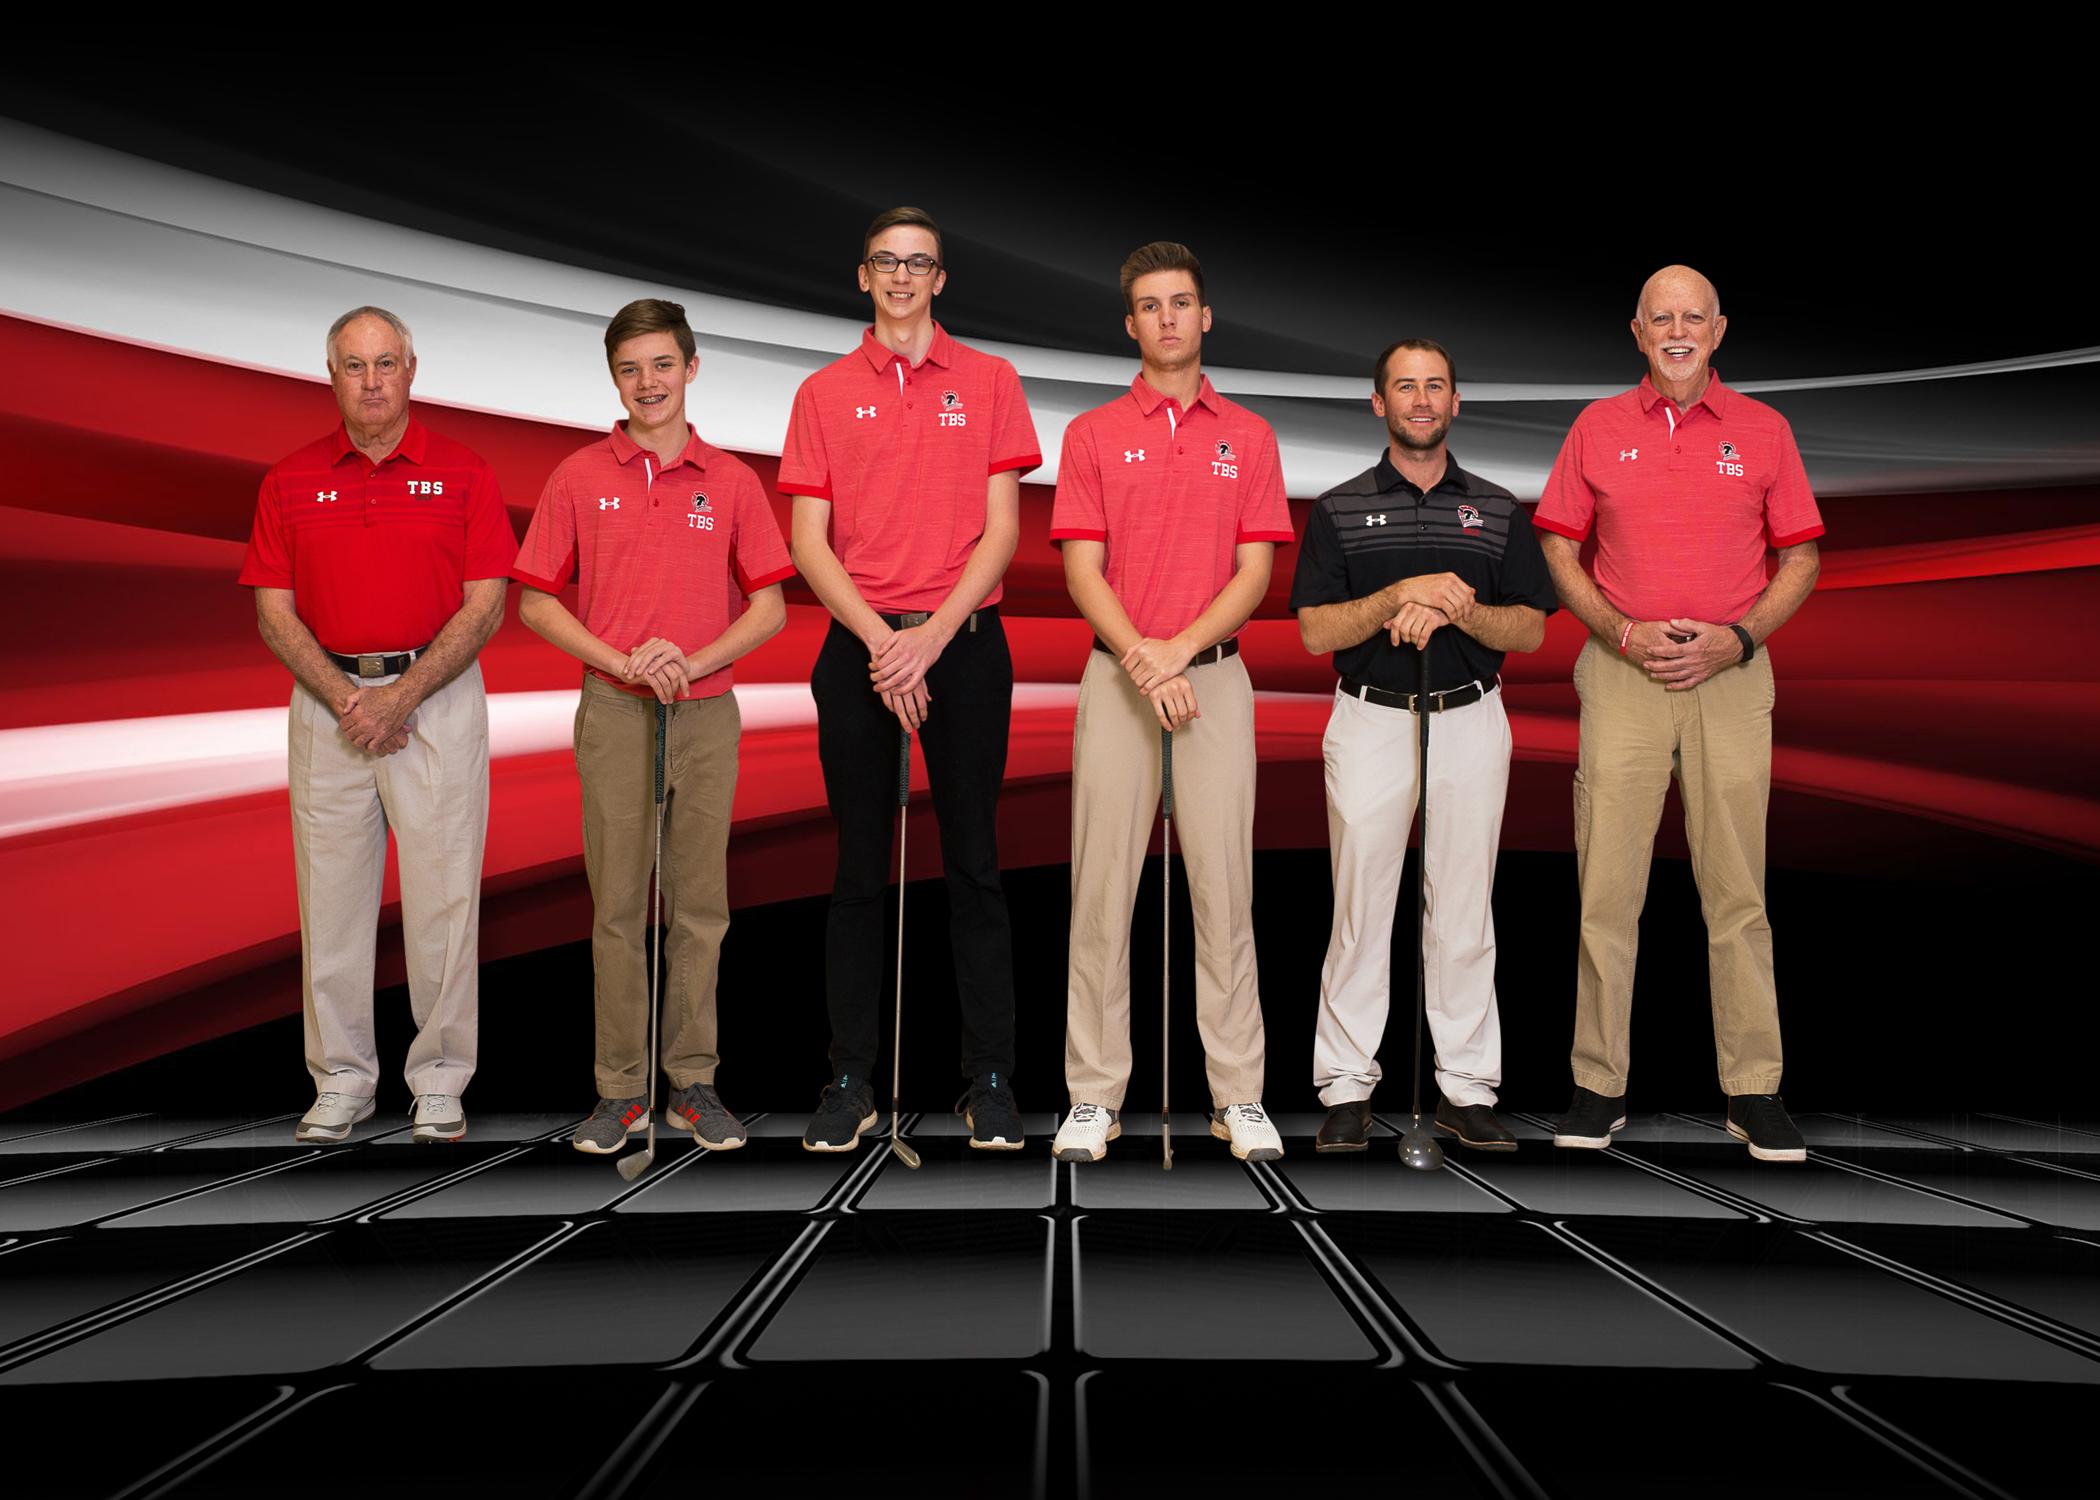 varsity boys golf team